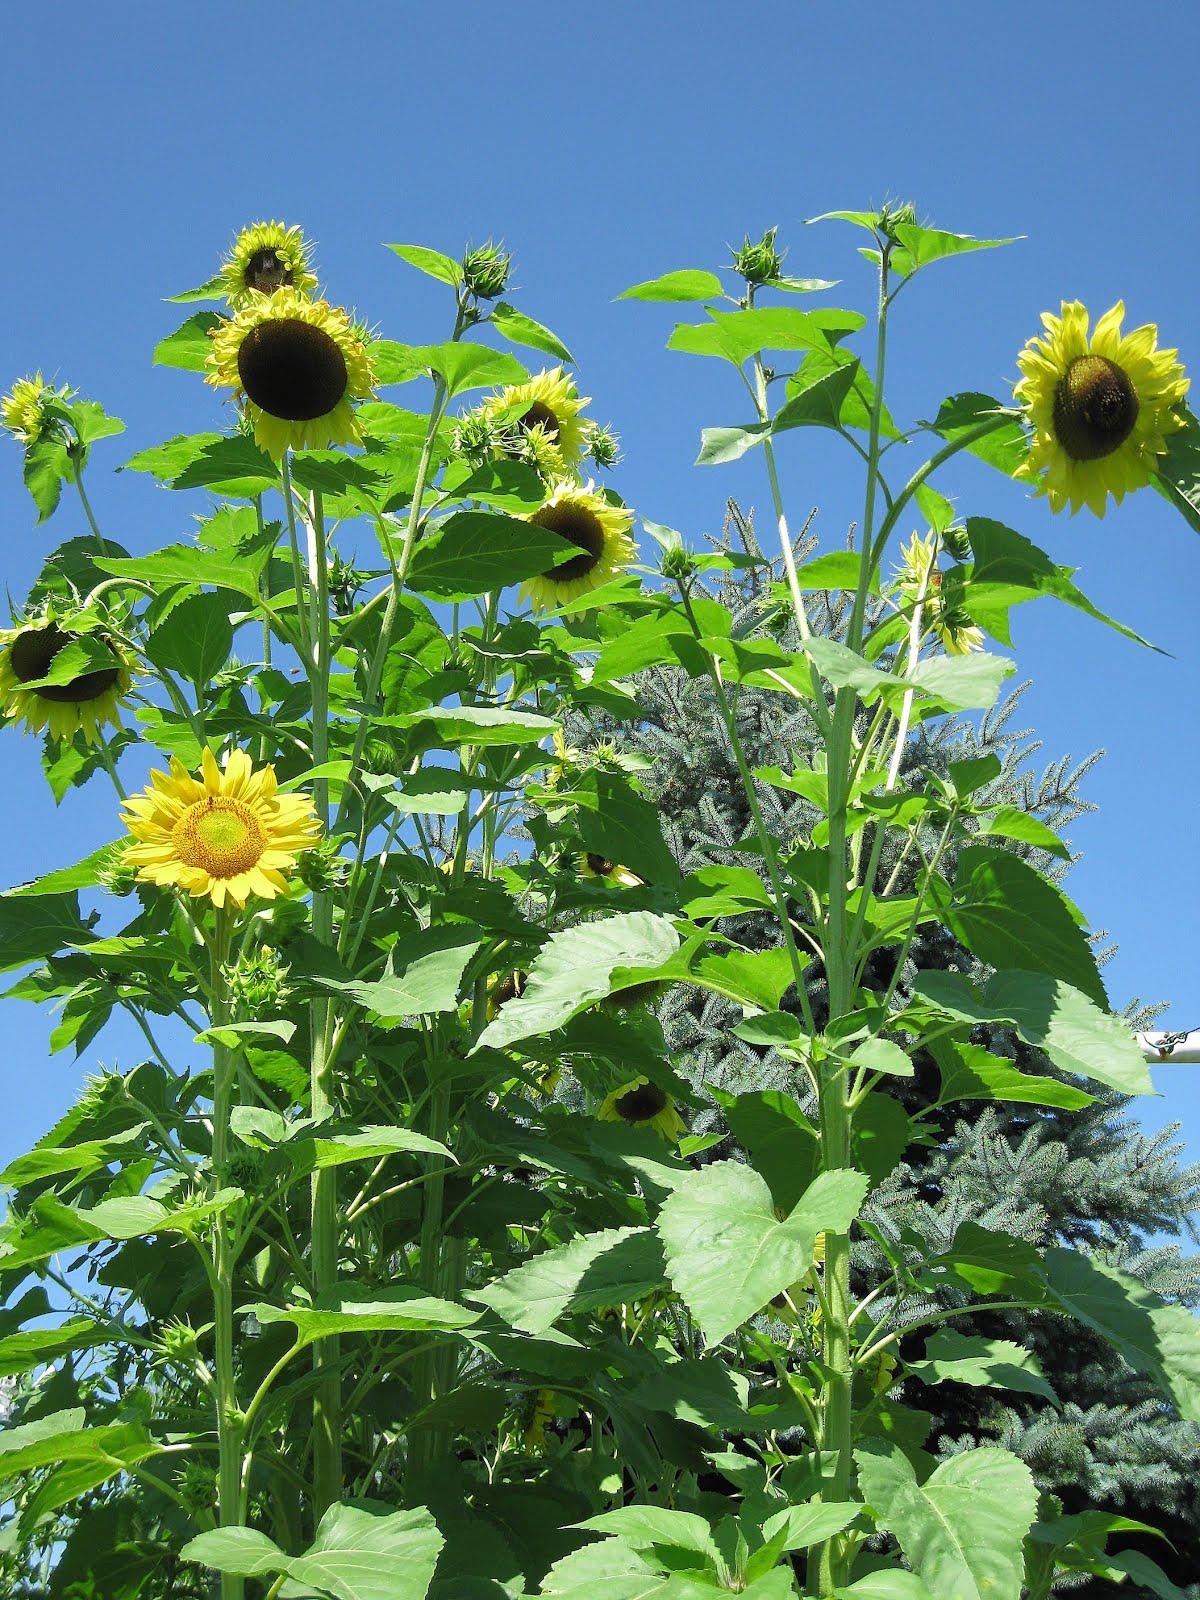 Nature Knitter: Sunflowers & Squirrels